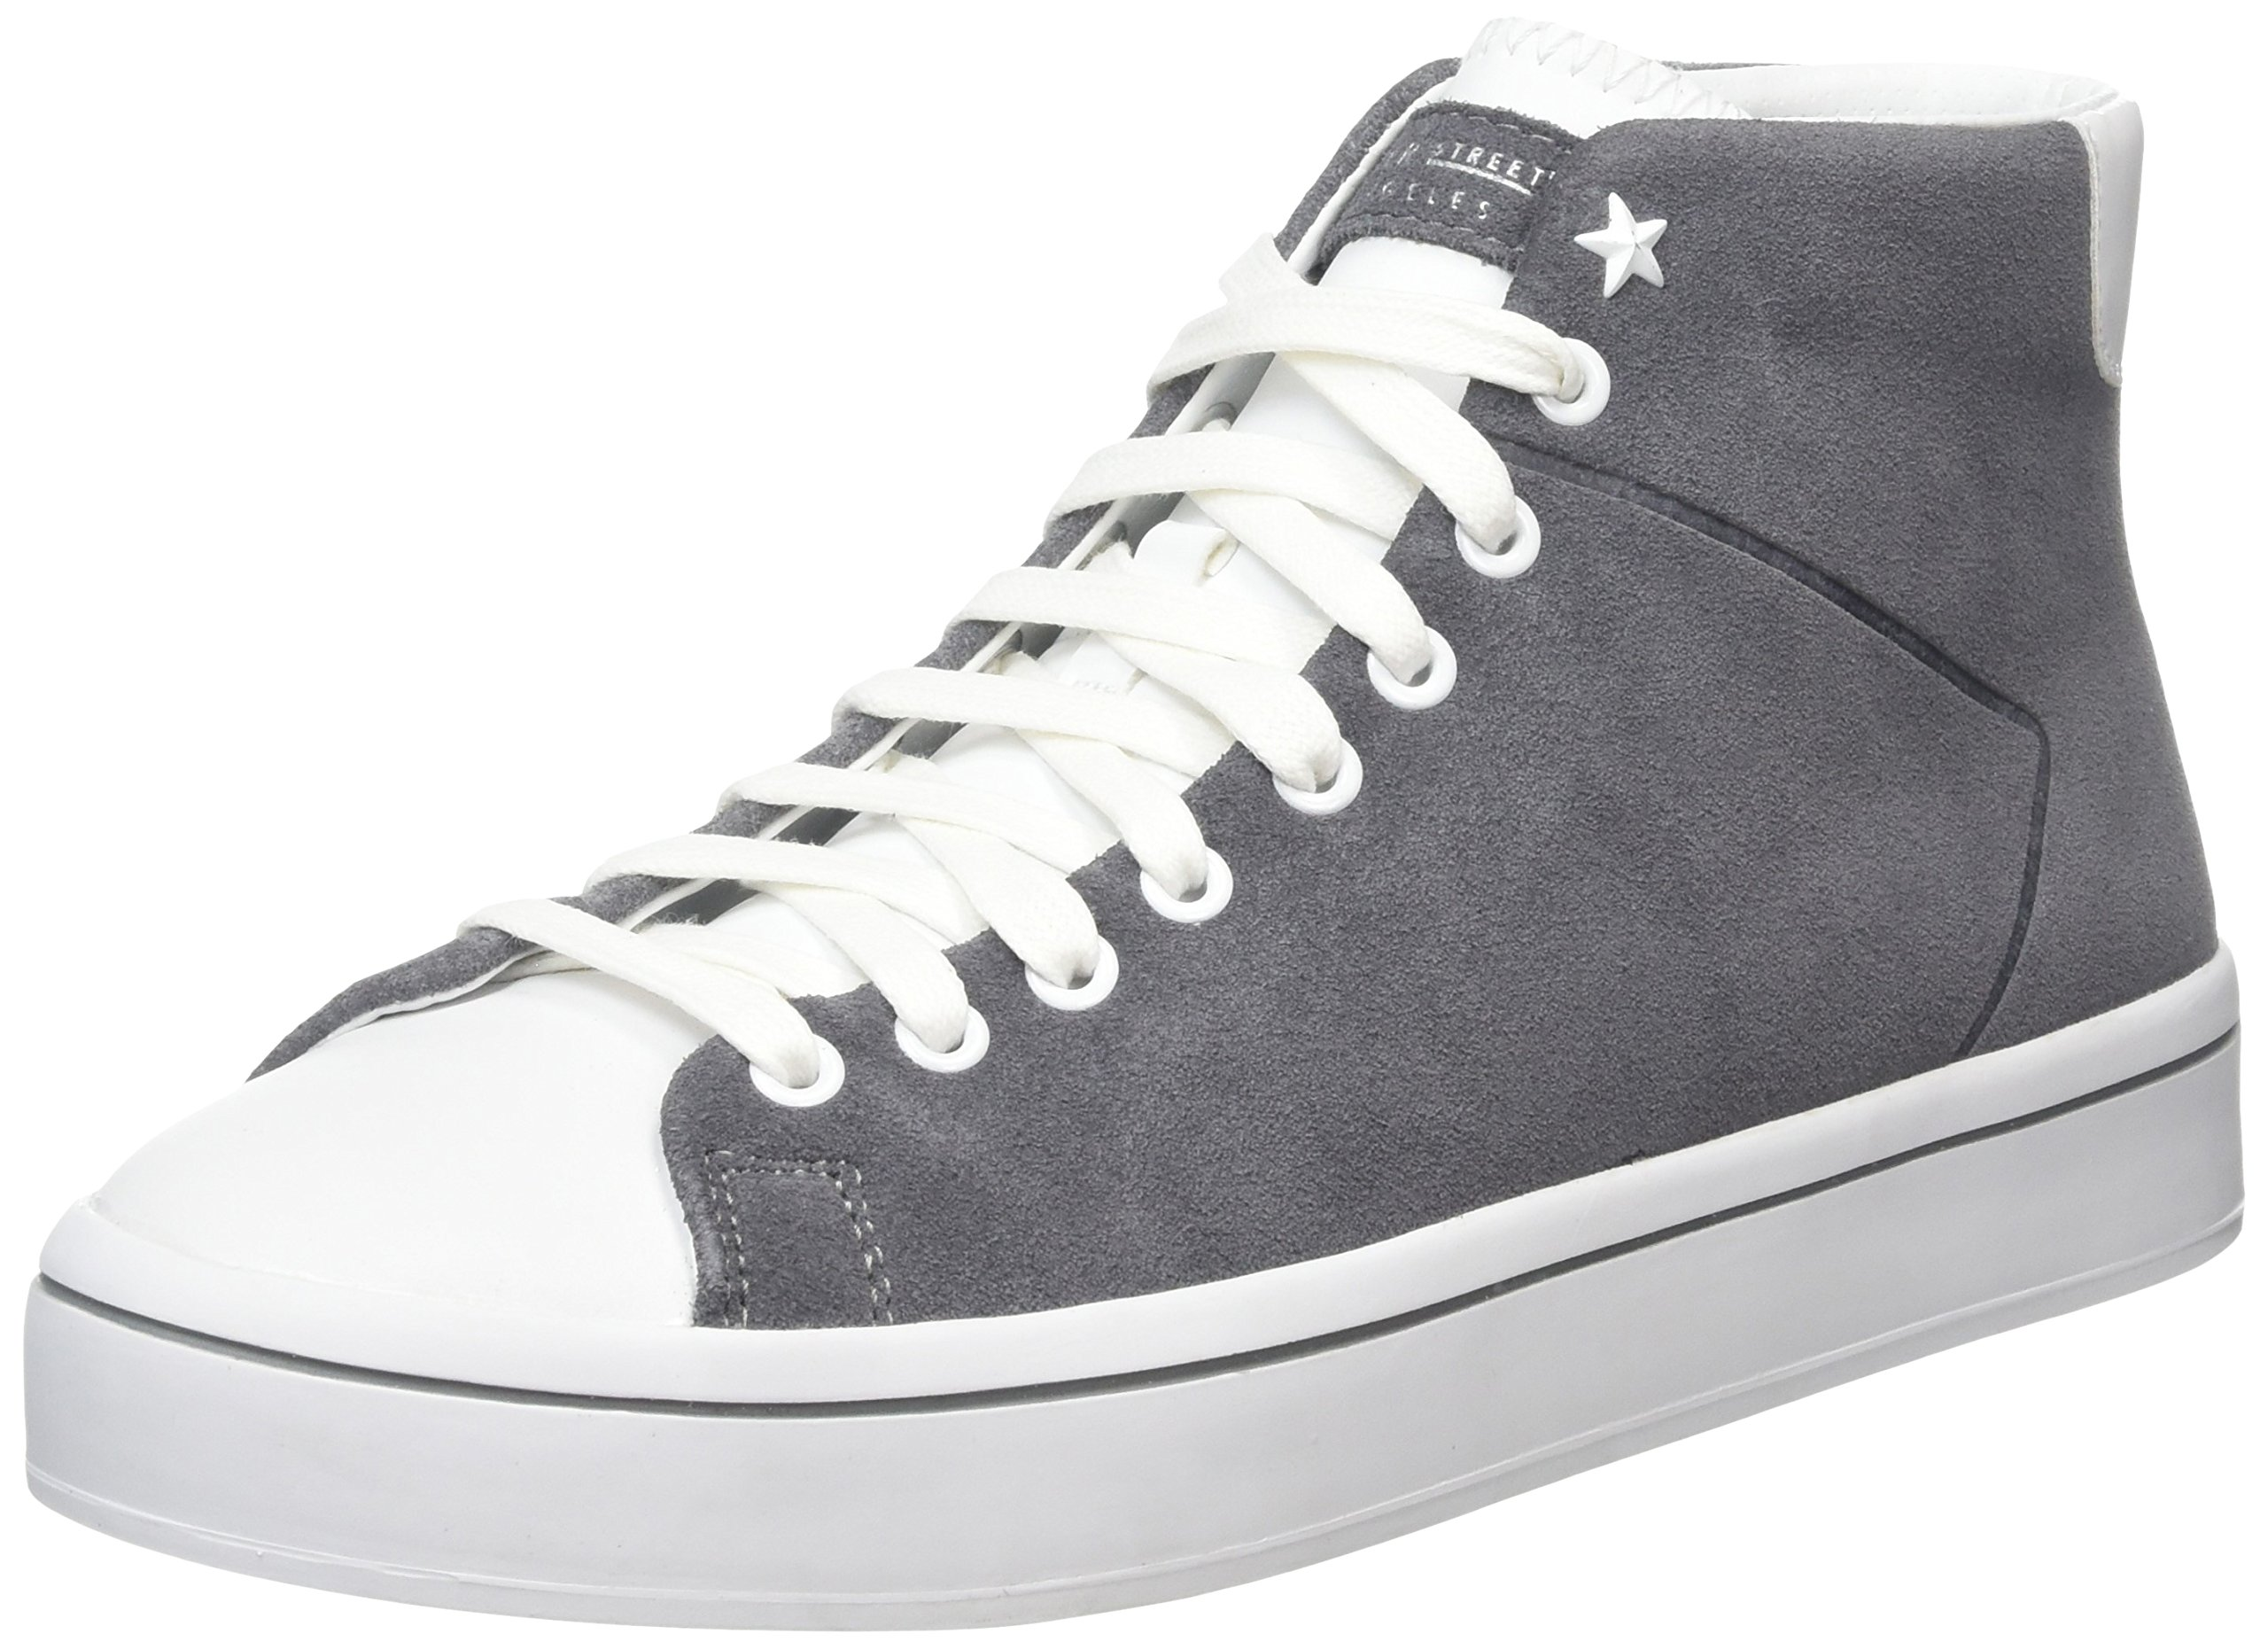 Skechers Hi-Lite Sugar High Womens Court-Style High Top Sneakers Gray 11